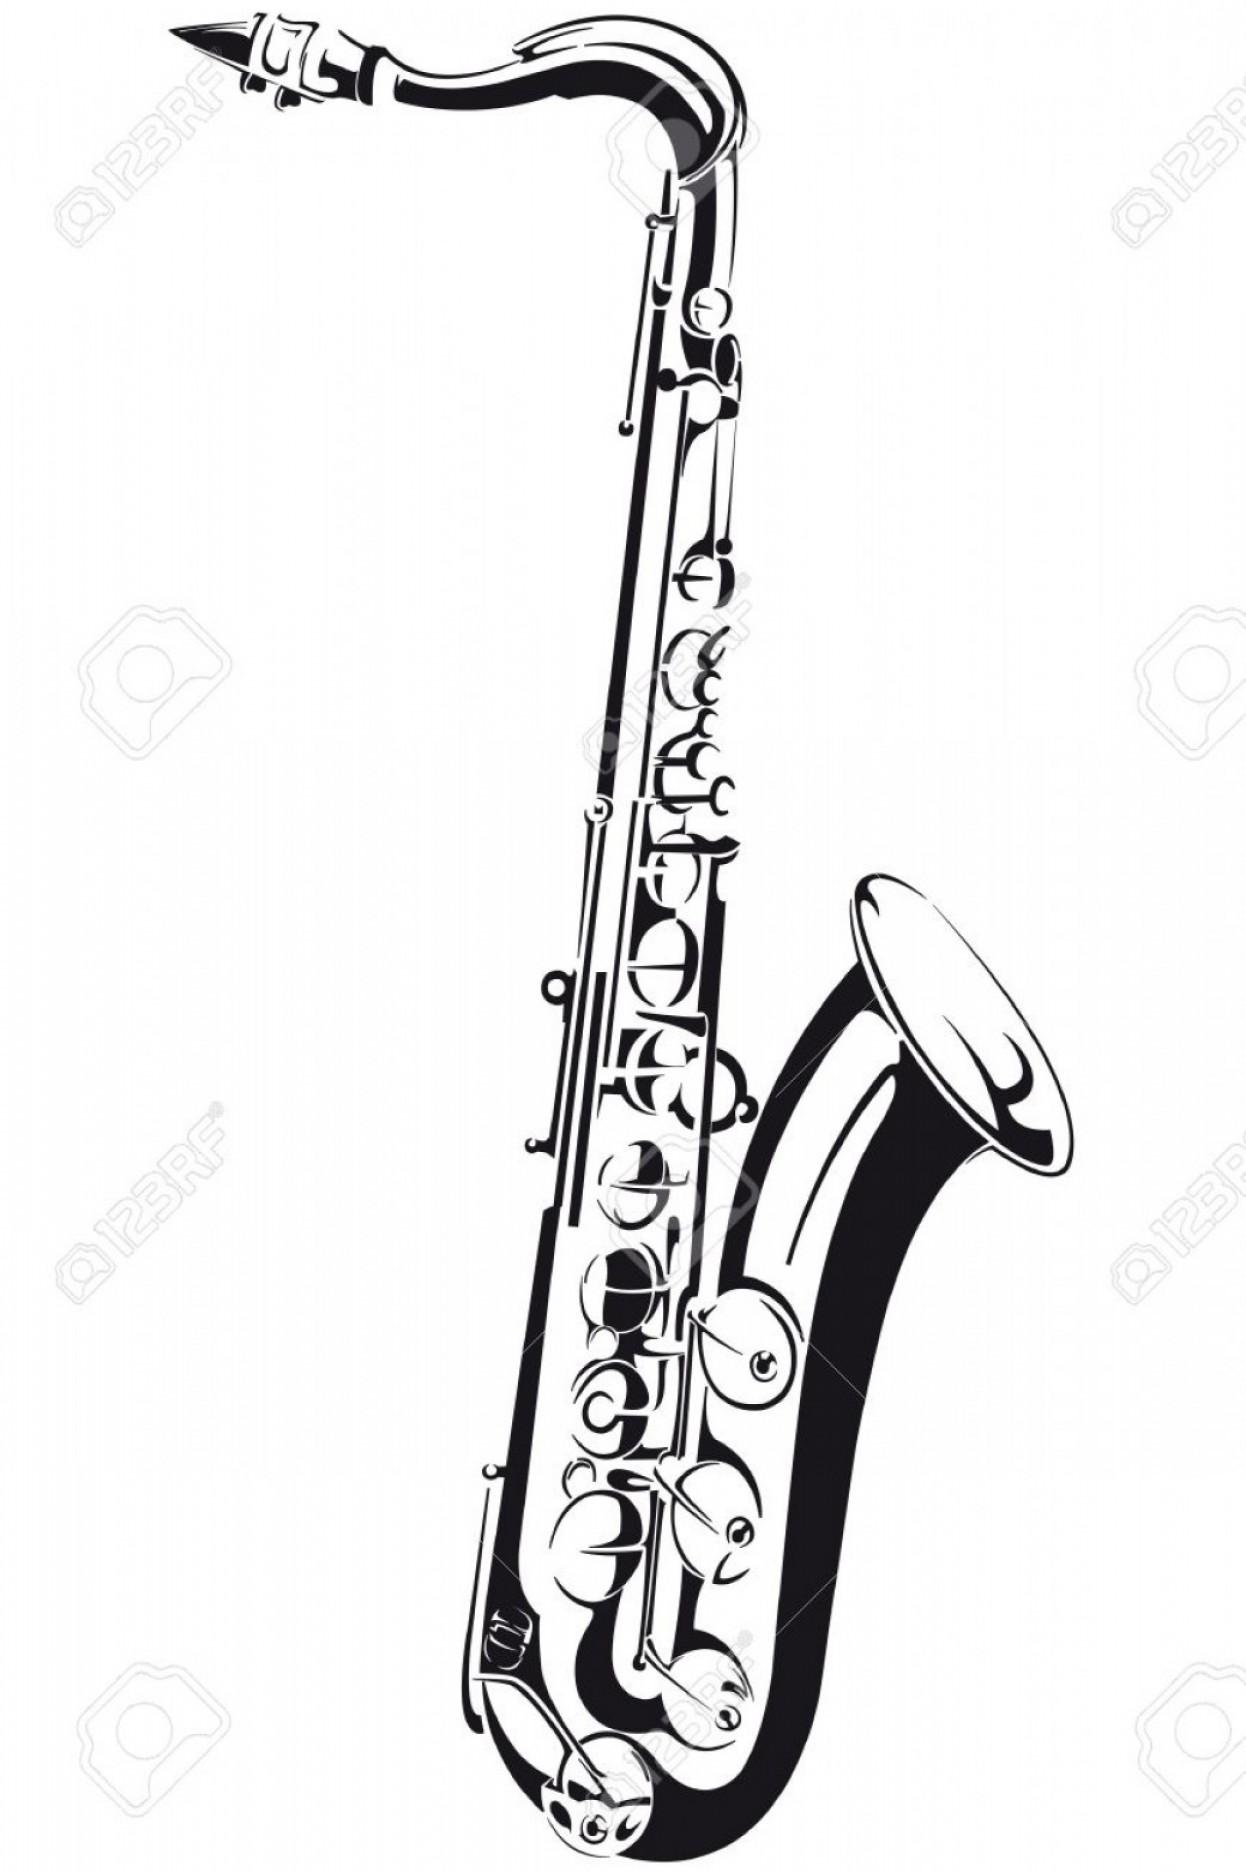 1246x1872 Photoline Drawing Of A Saxophone Isolated On Background Soidergi